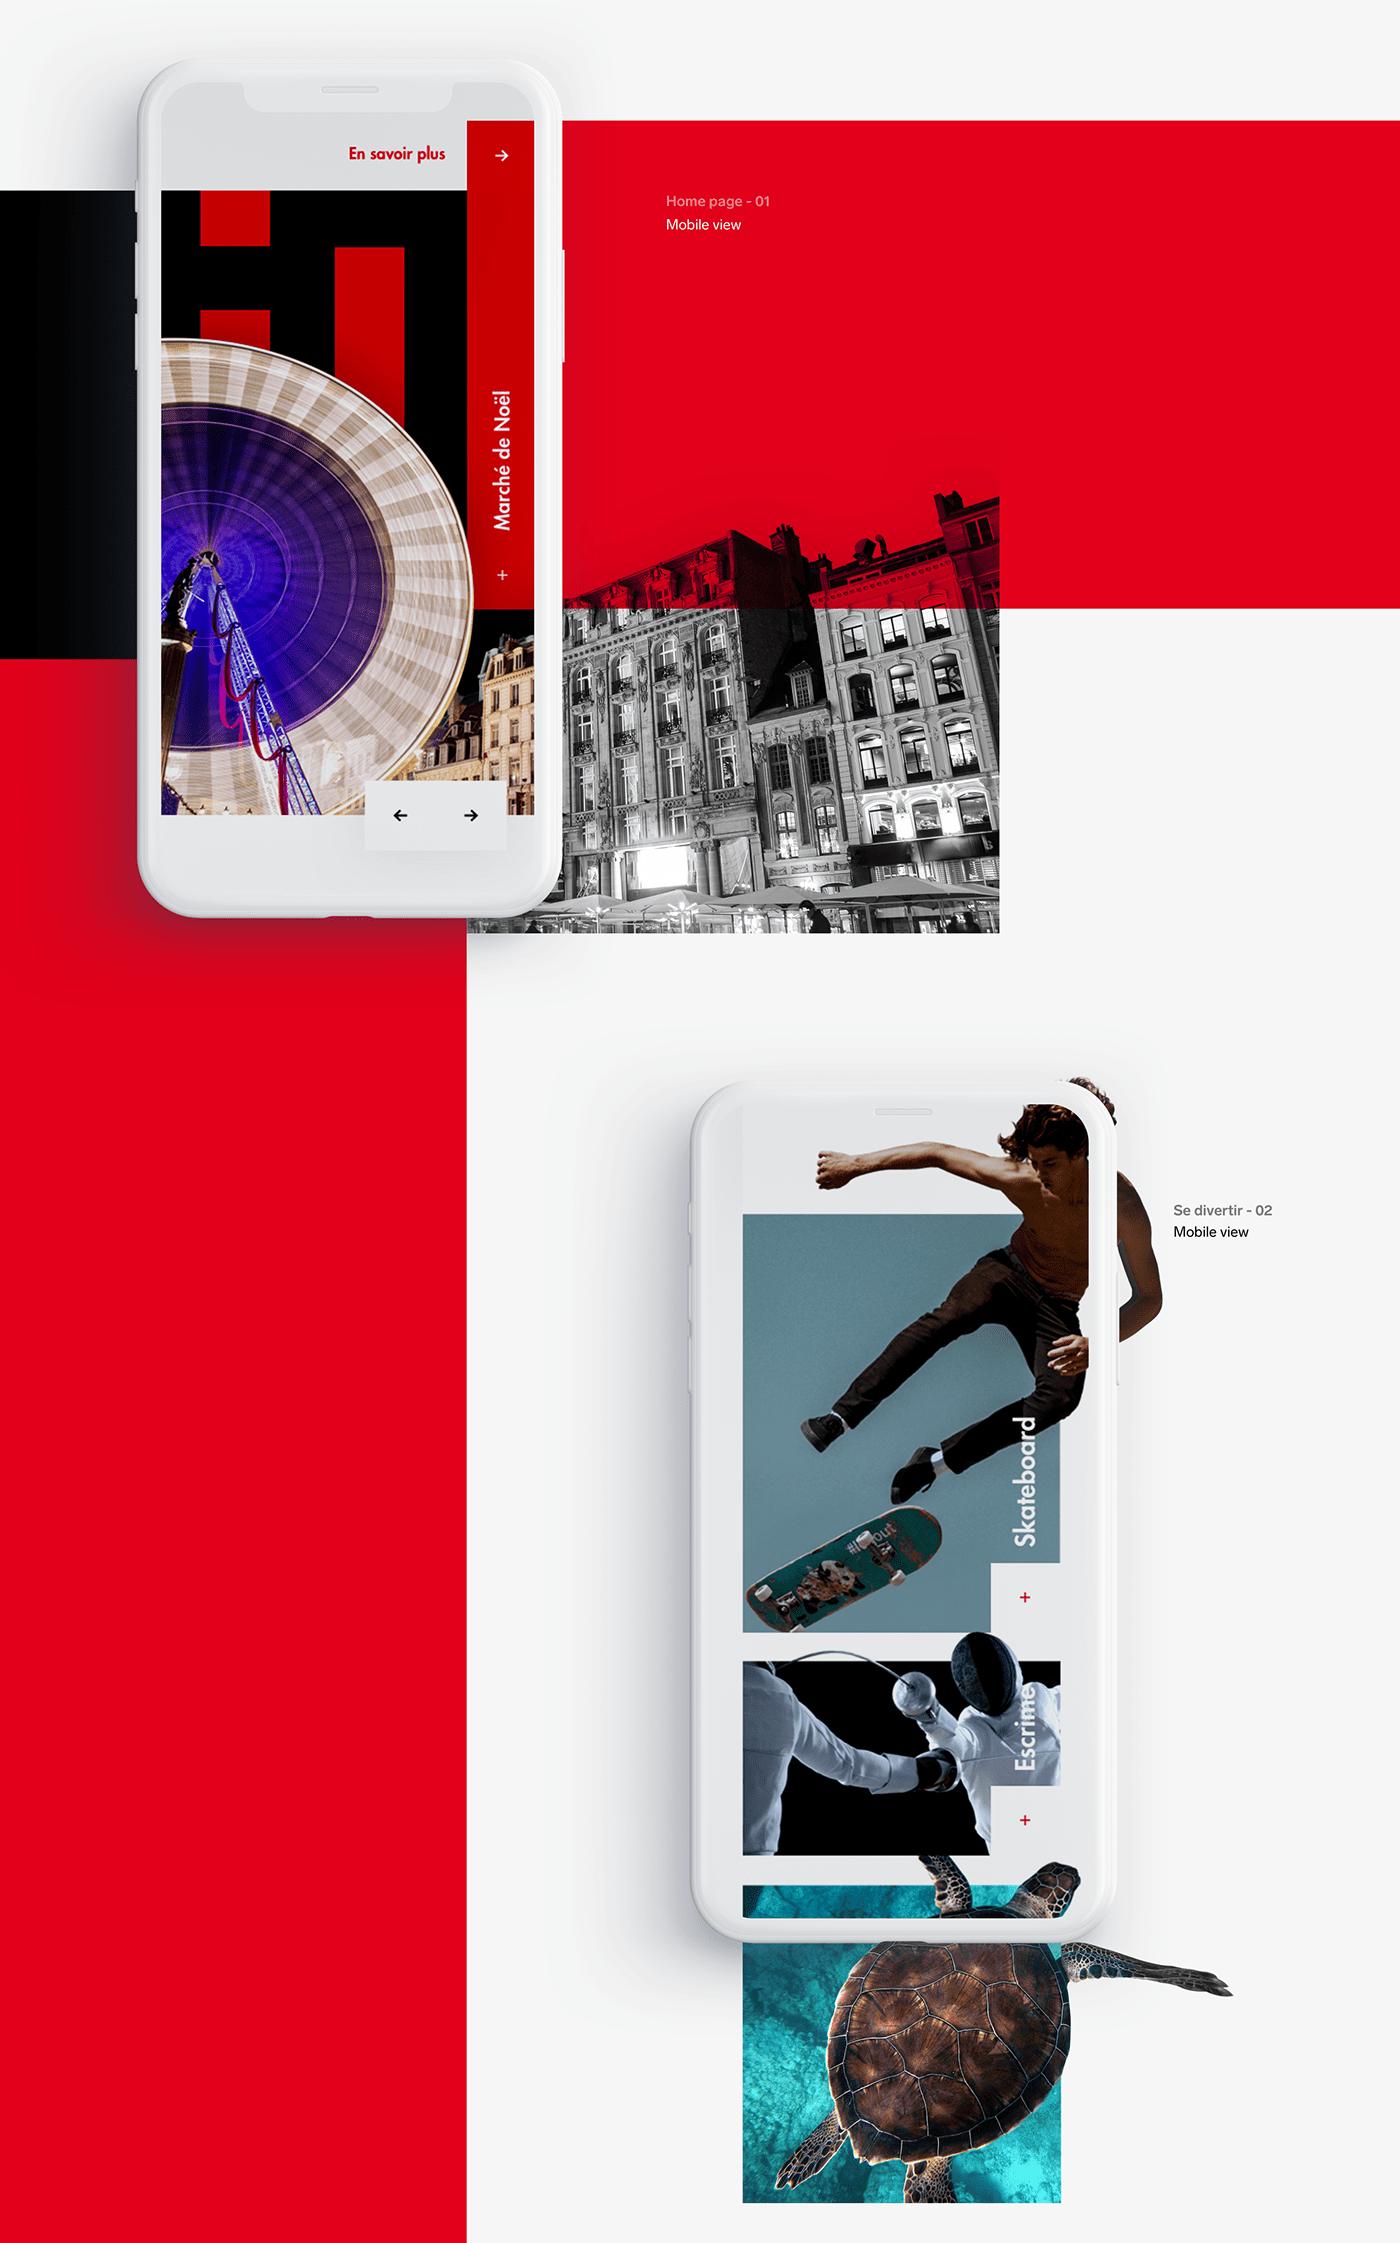 lille UI Webdesign interface web Responsive Design concept ui ui design user experience visual identity Website